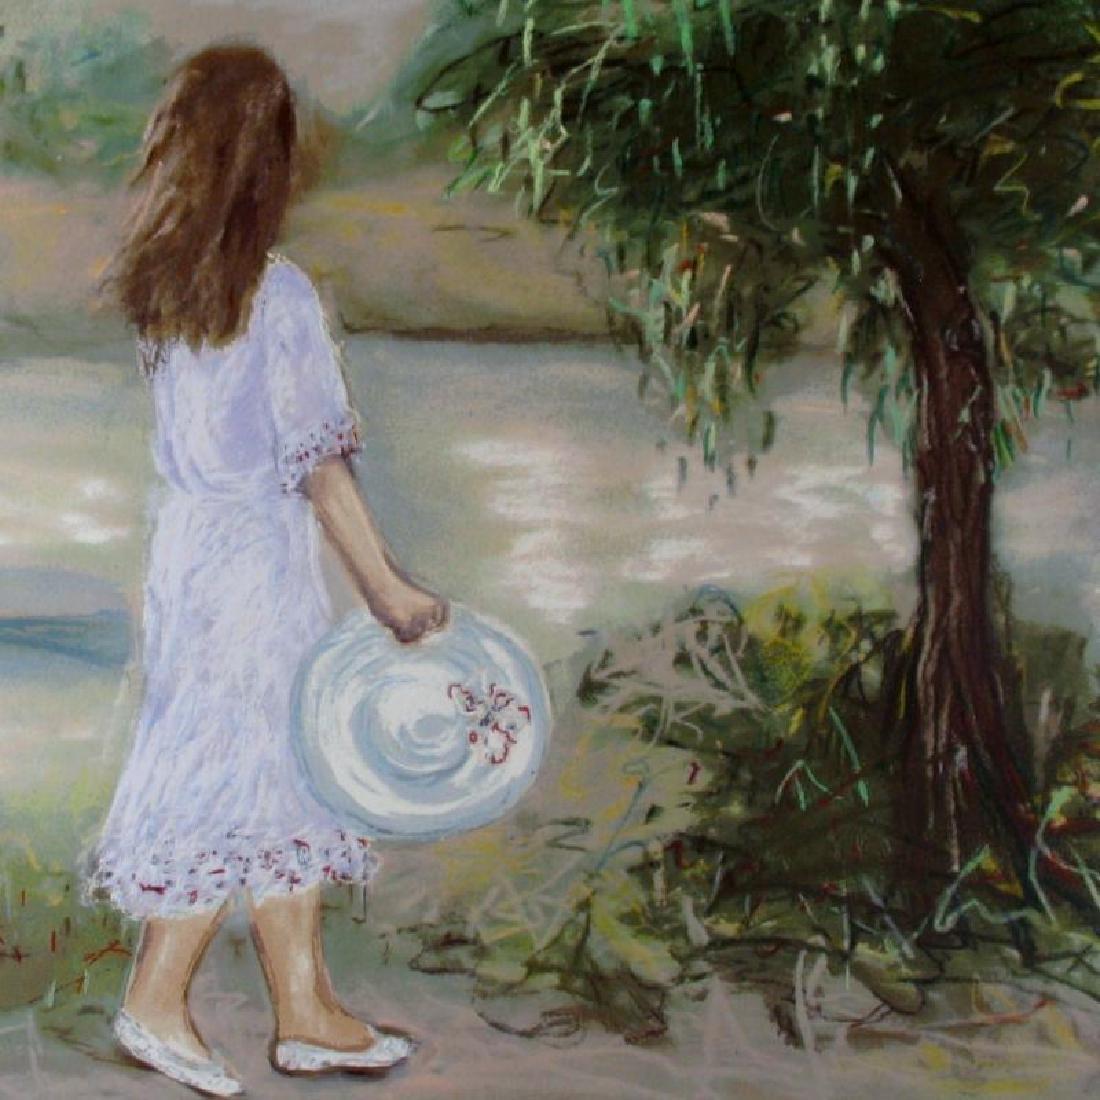 Landscape Impressionism Girl With Hat Dealer Liquidates - 4